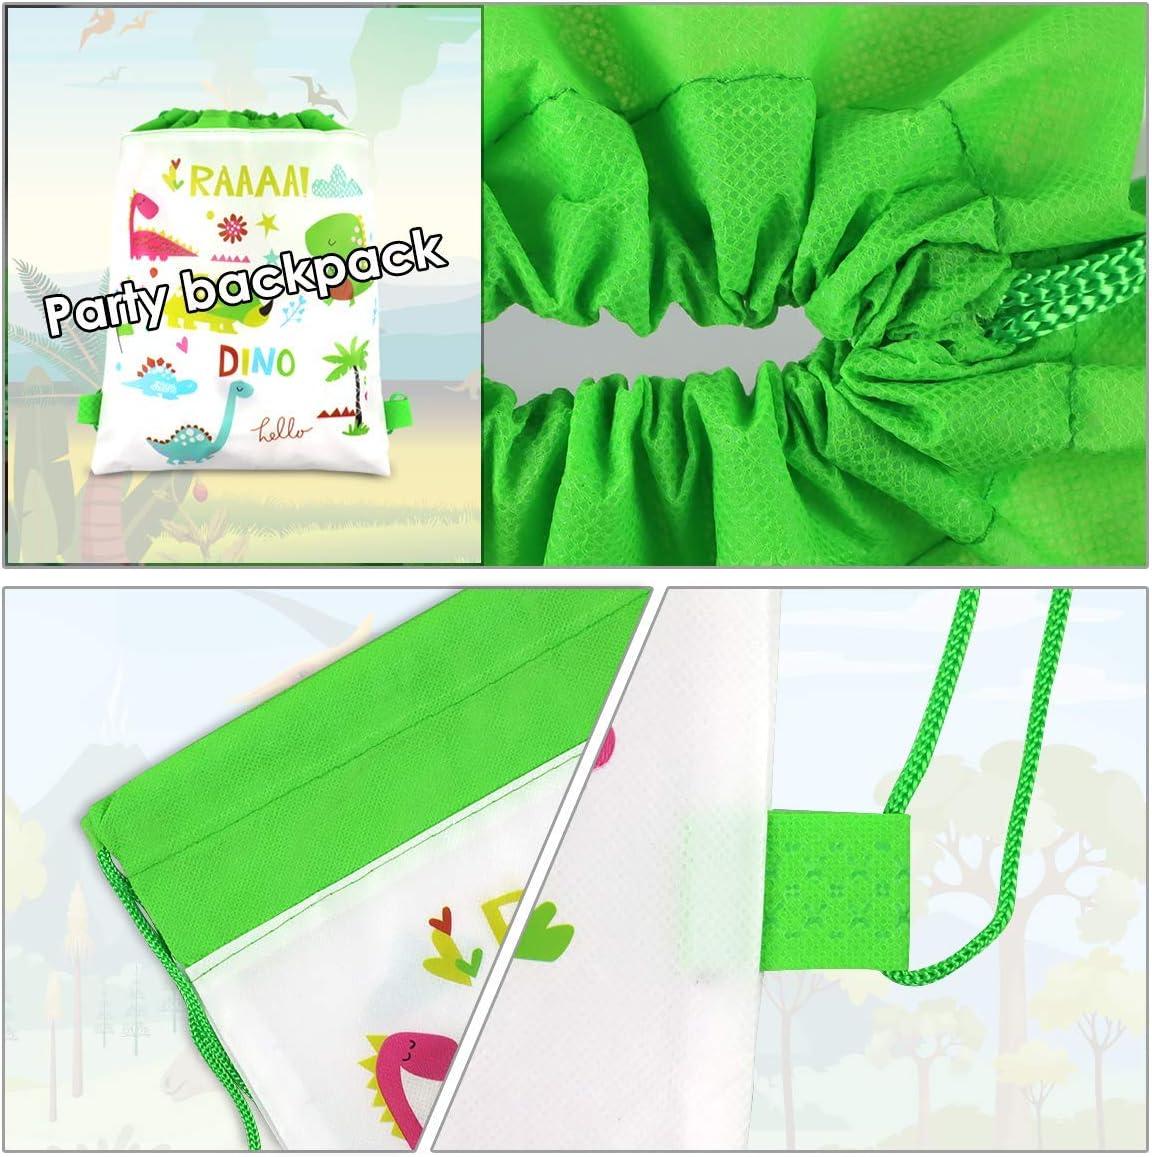 Dinosaur Birthday Party Supplies Dinosaur Party Bags for kids birthday Gift Bag Dinosaur Toys POKONBOY 24 Pack Dinosaur Party Favors Bags for Gift Bag